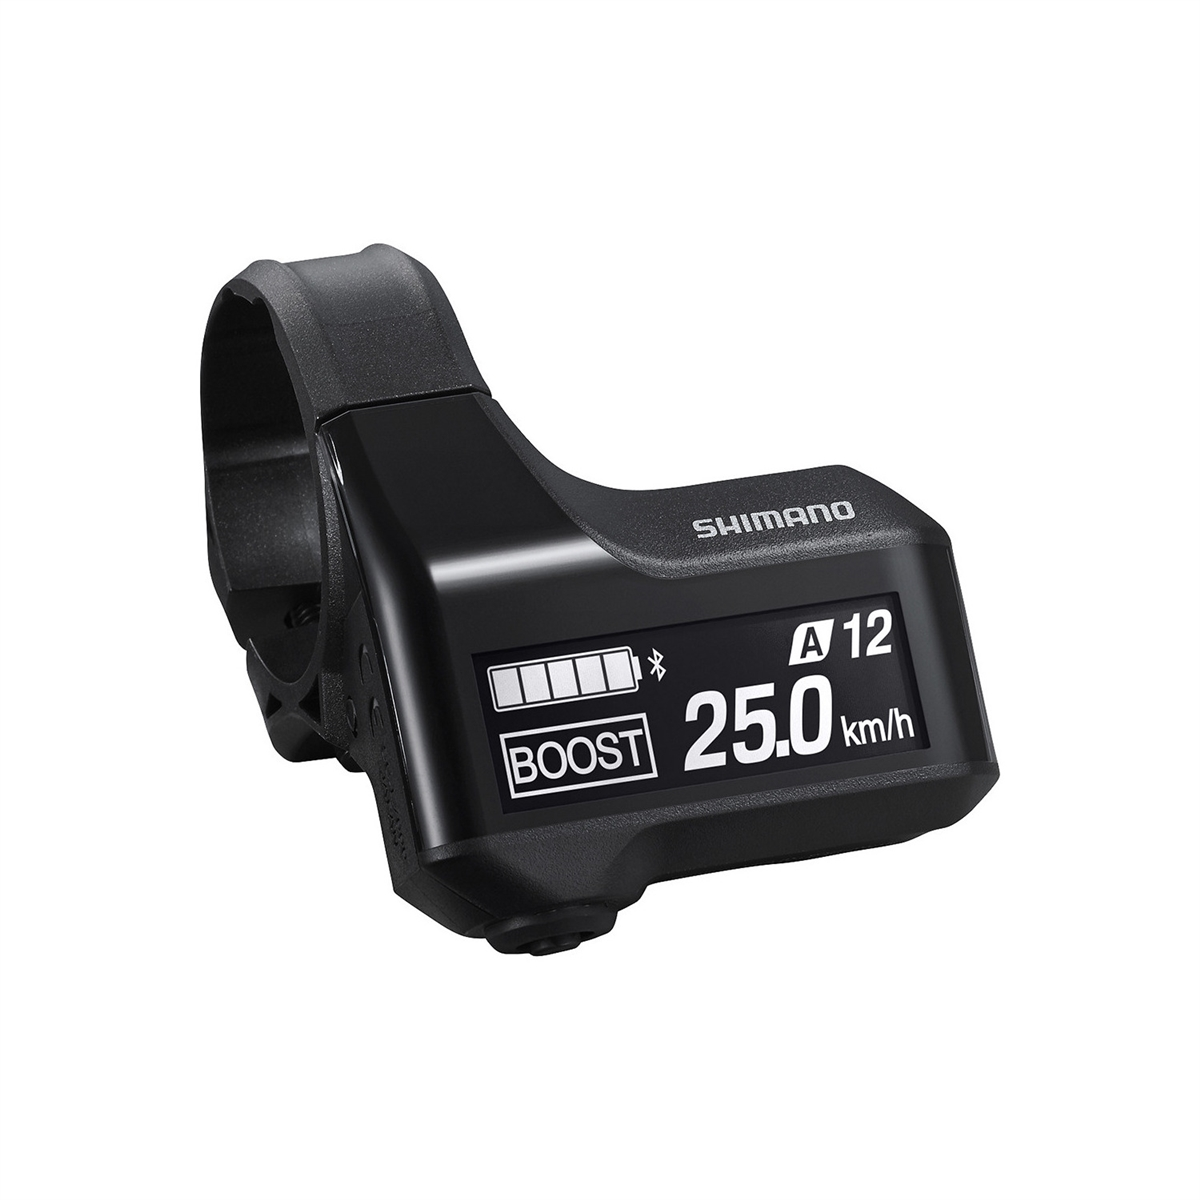 E-Bike Wireless Display Di2 STEPS SC-E7000